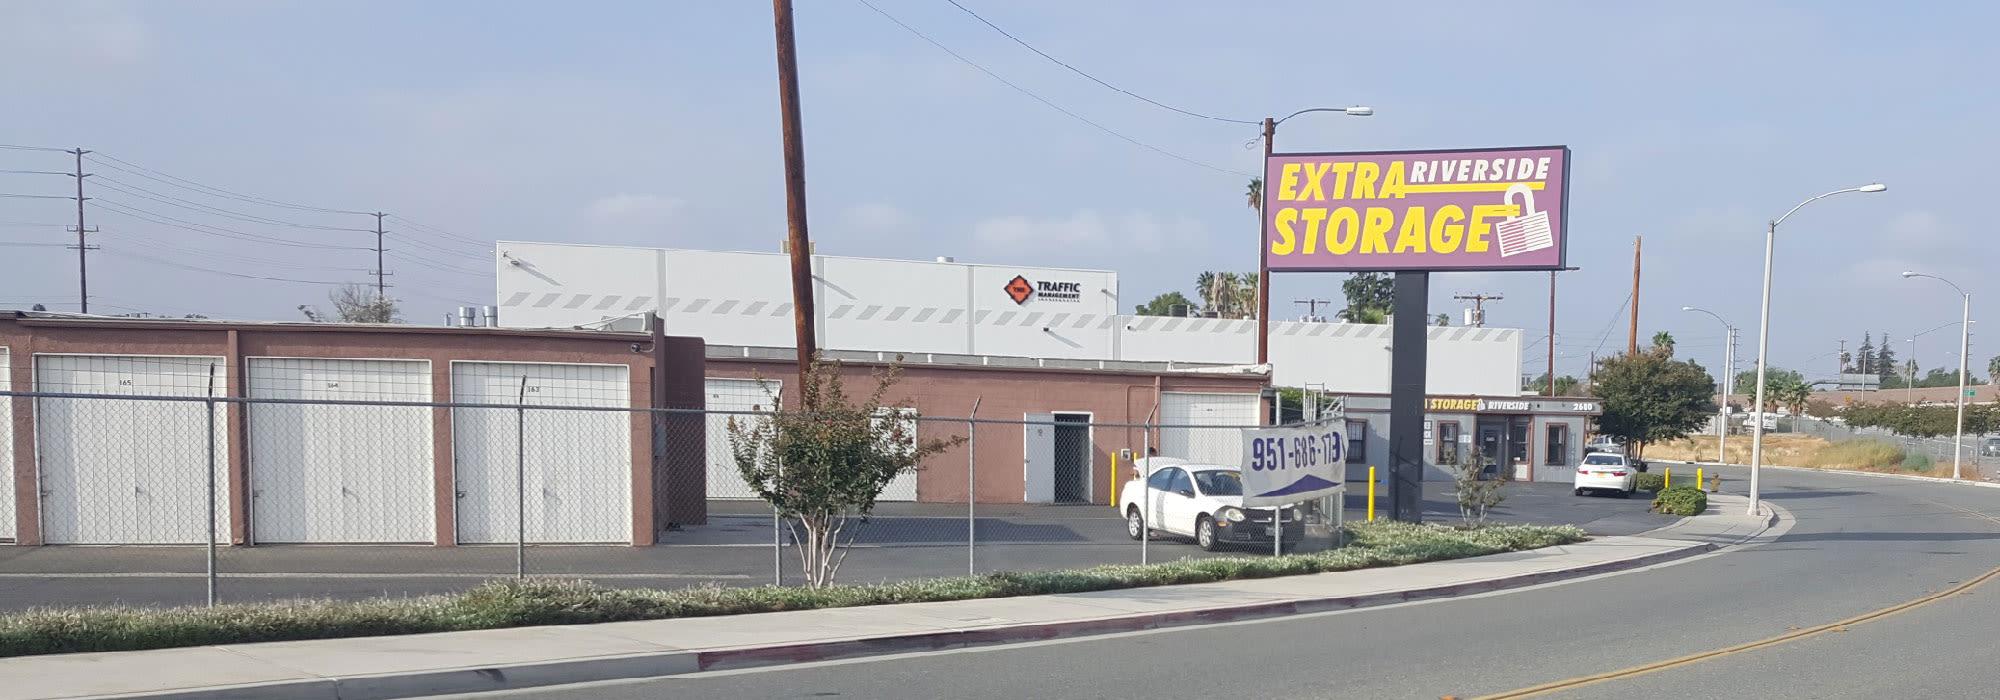 Self Storage Downtown Riverside California Extra